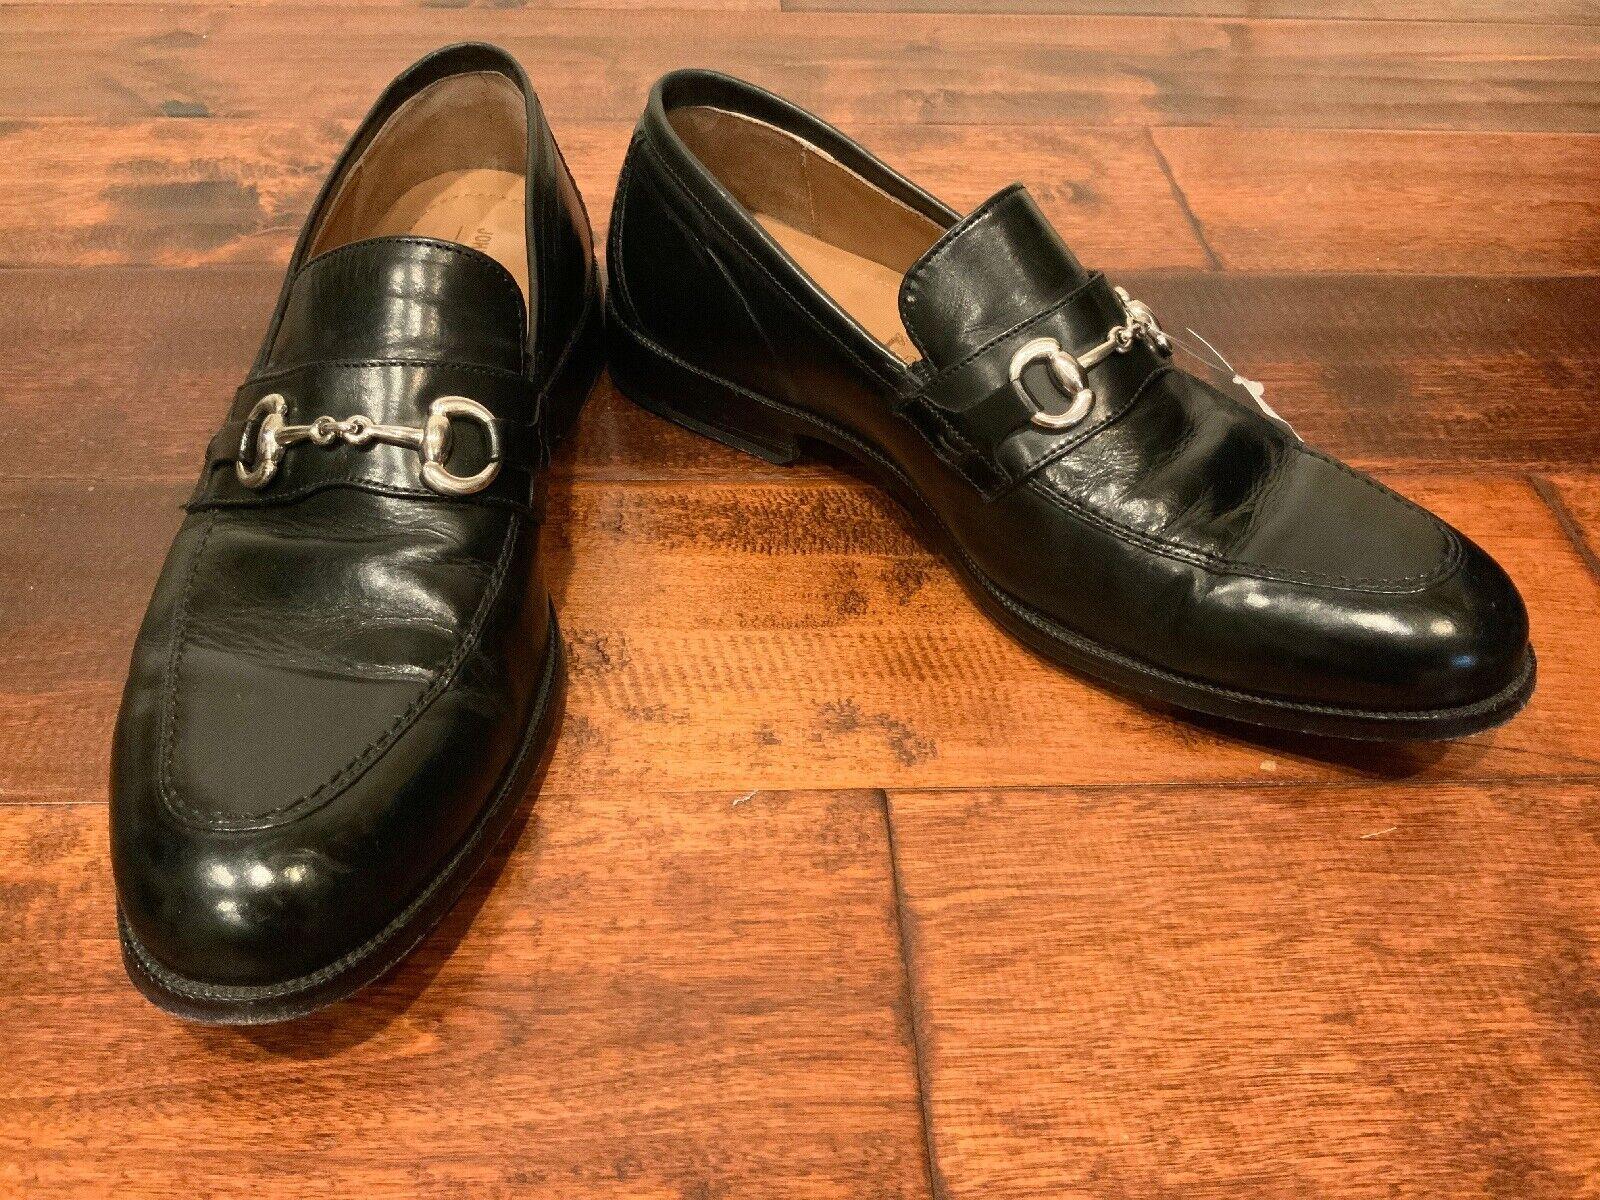 Johnston & Murphy Signature Series Black Neilson Bit Loafers, Size 10